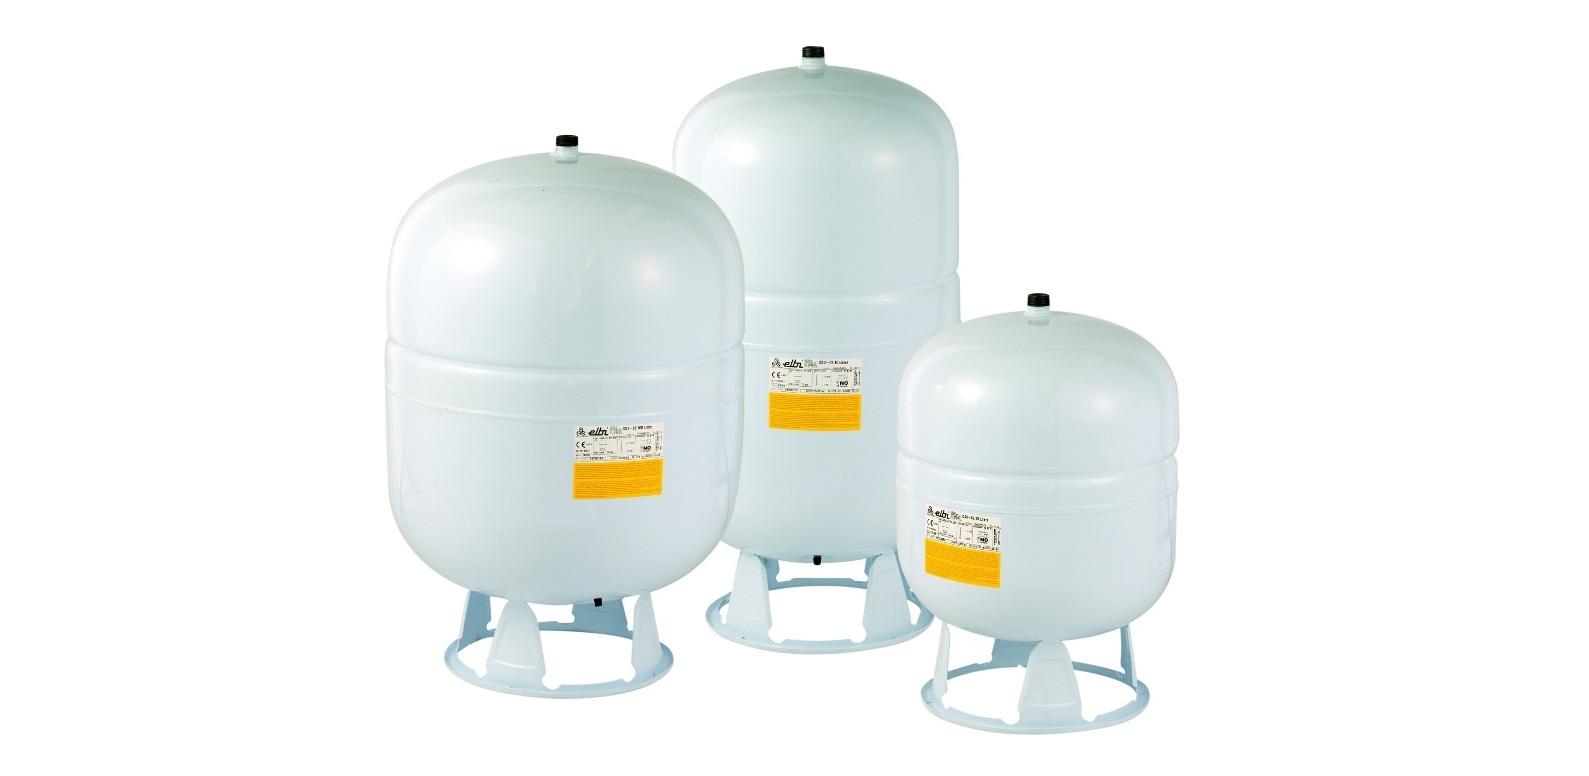 Solar Vessels